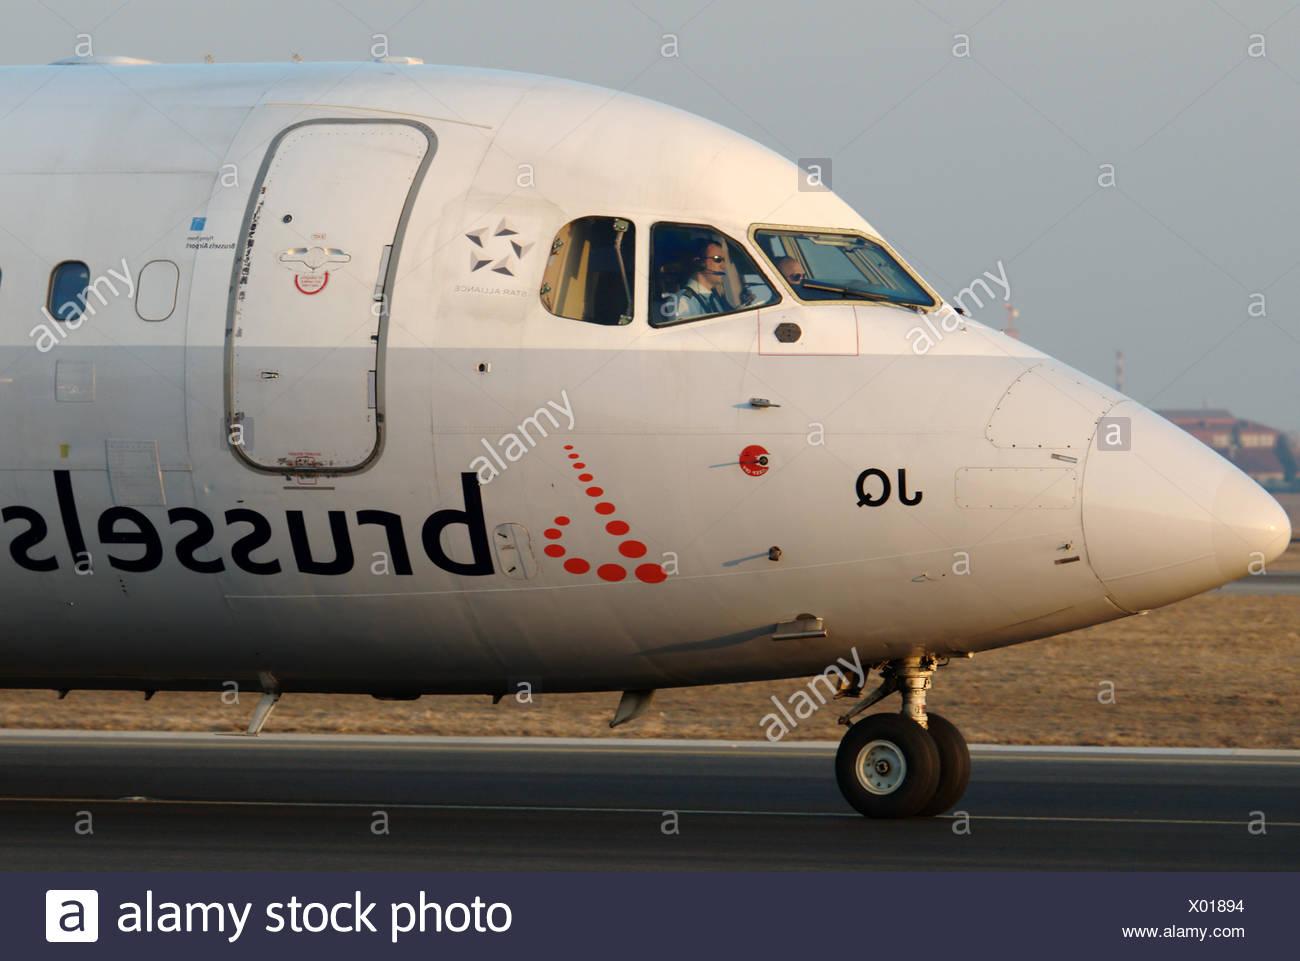 Brussels Airlines British Aerospace BAe-146 - Stock Image